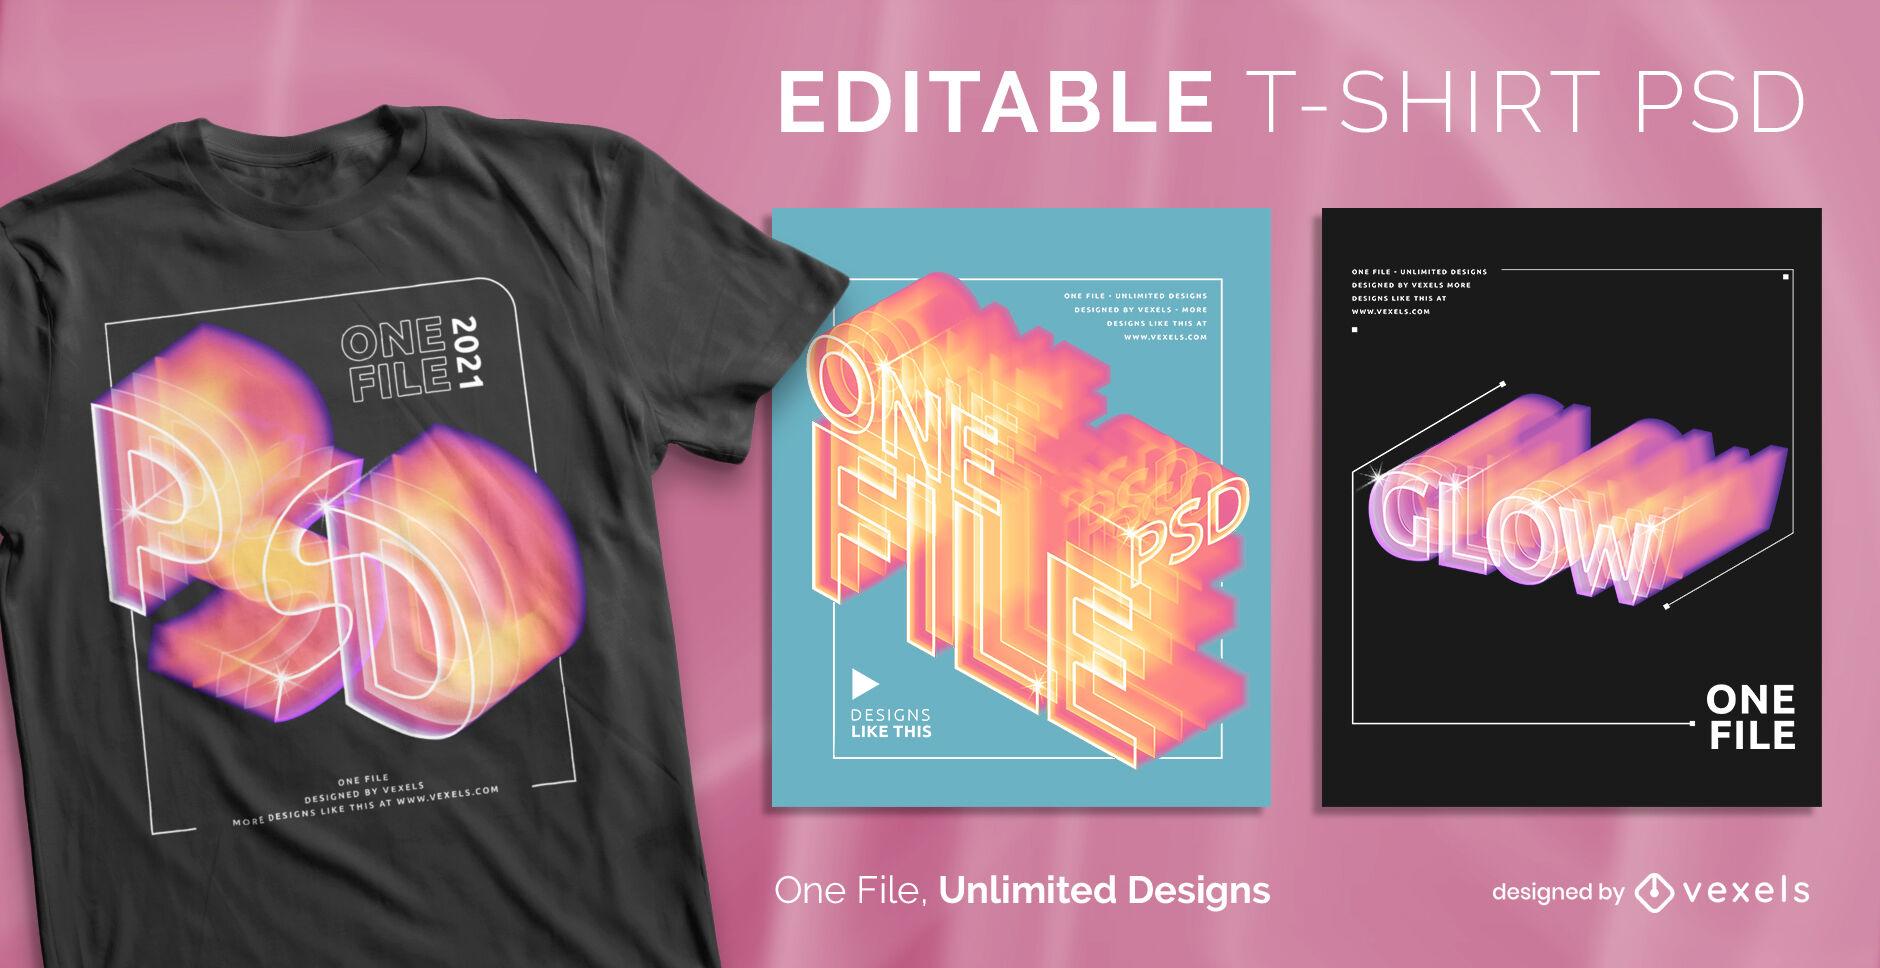 Camiseta psd escalable con efectos de degradado y brillo de texto